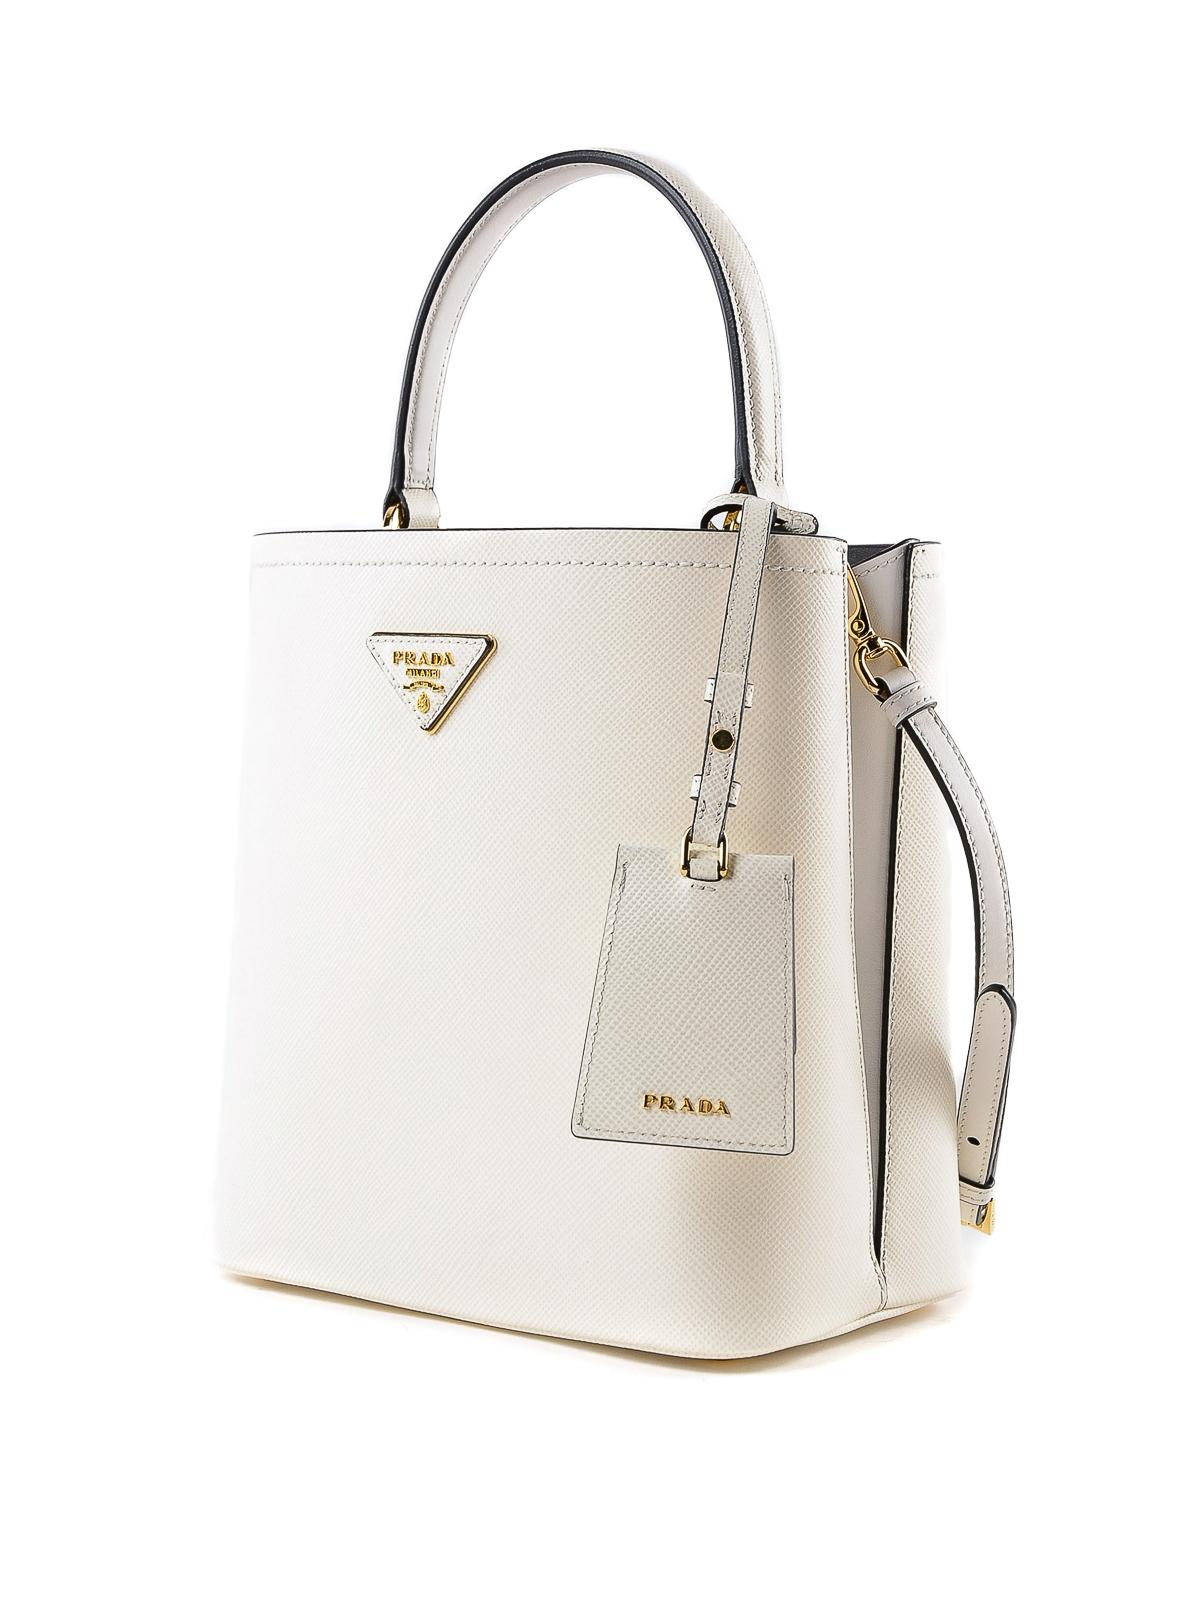 0bade0e39dde PRADA  Bucket bags online - White Saffiano leather double bucket bag